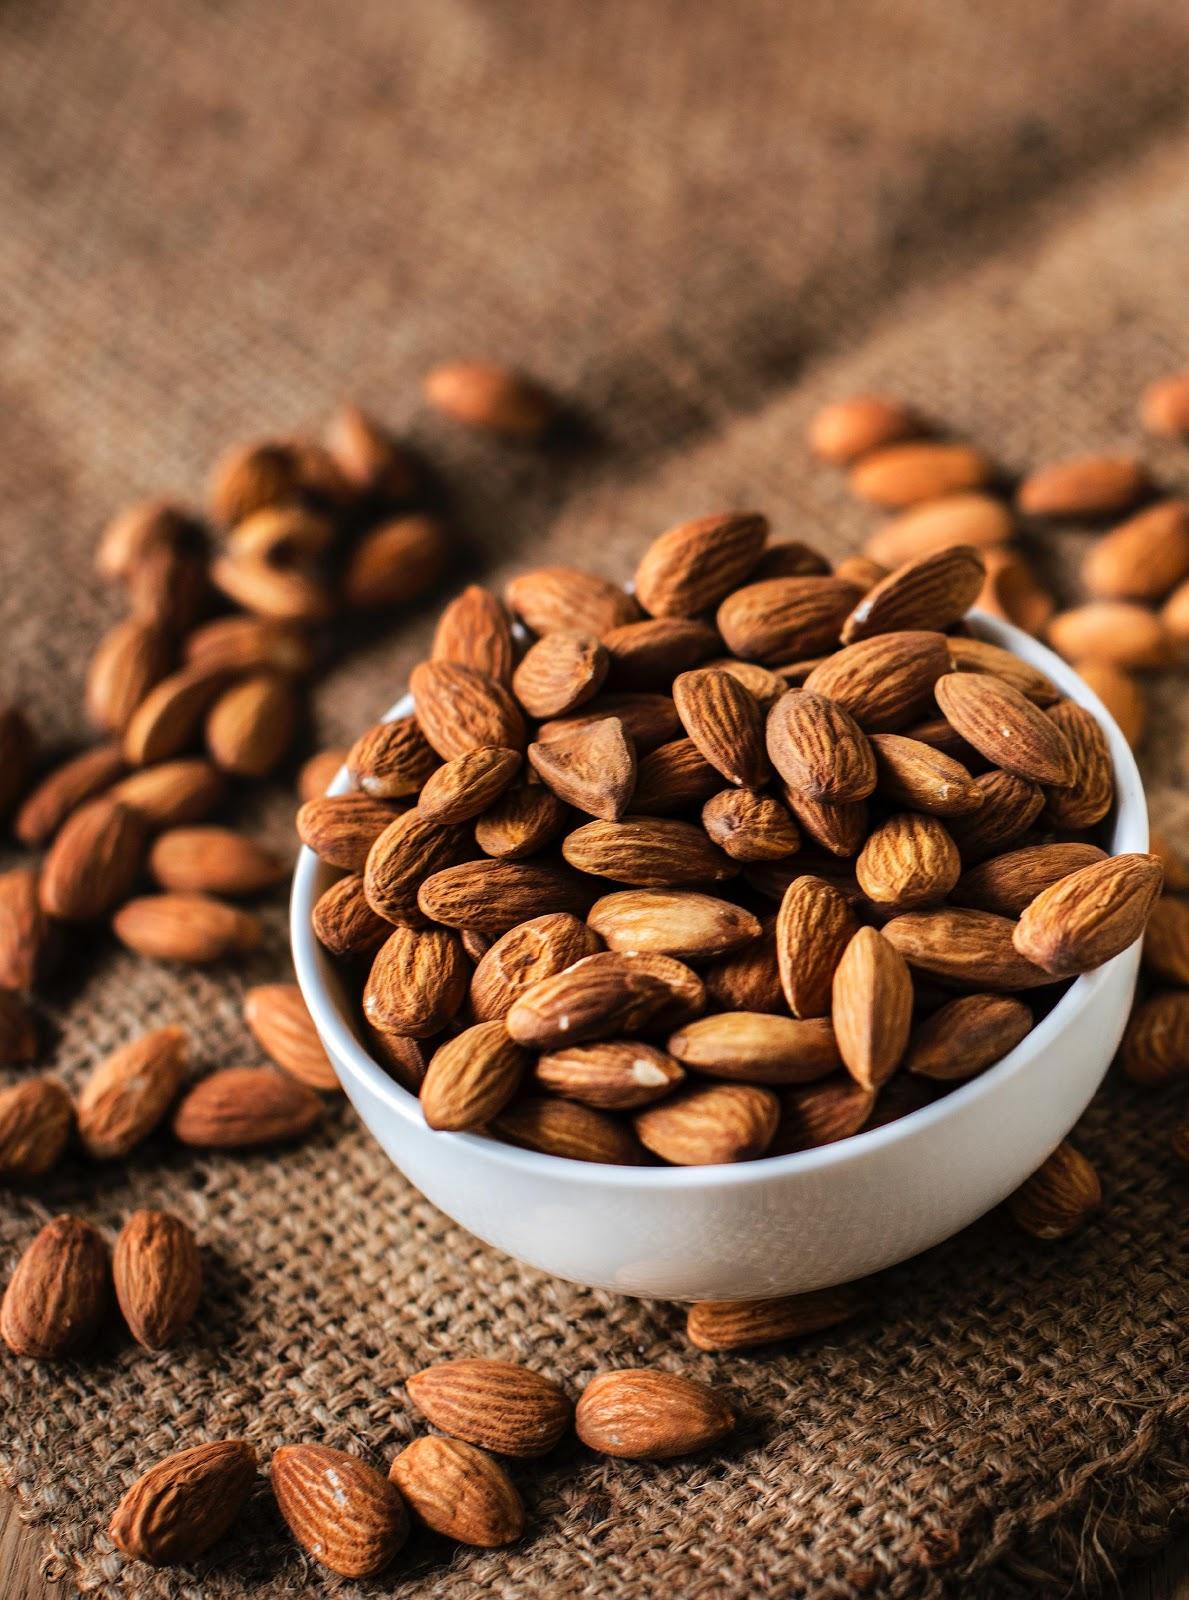 MB 10-06 - almonds